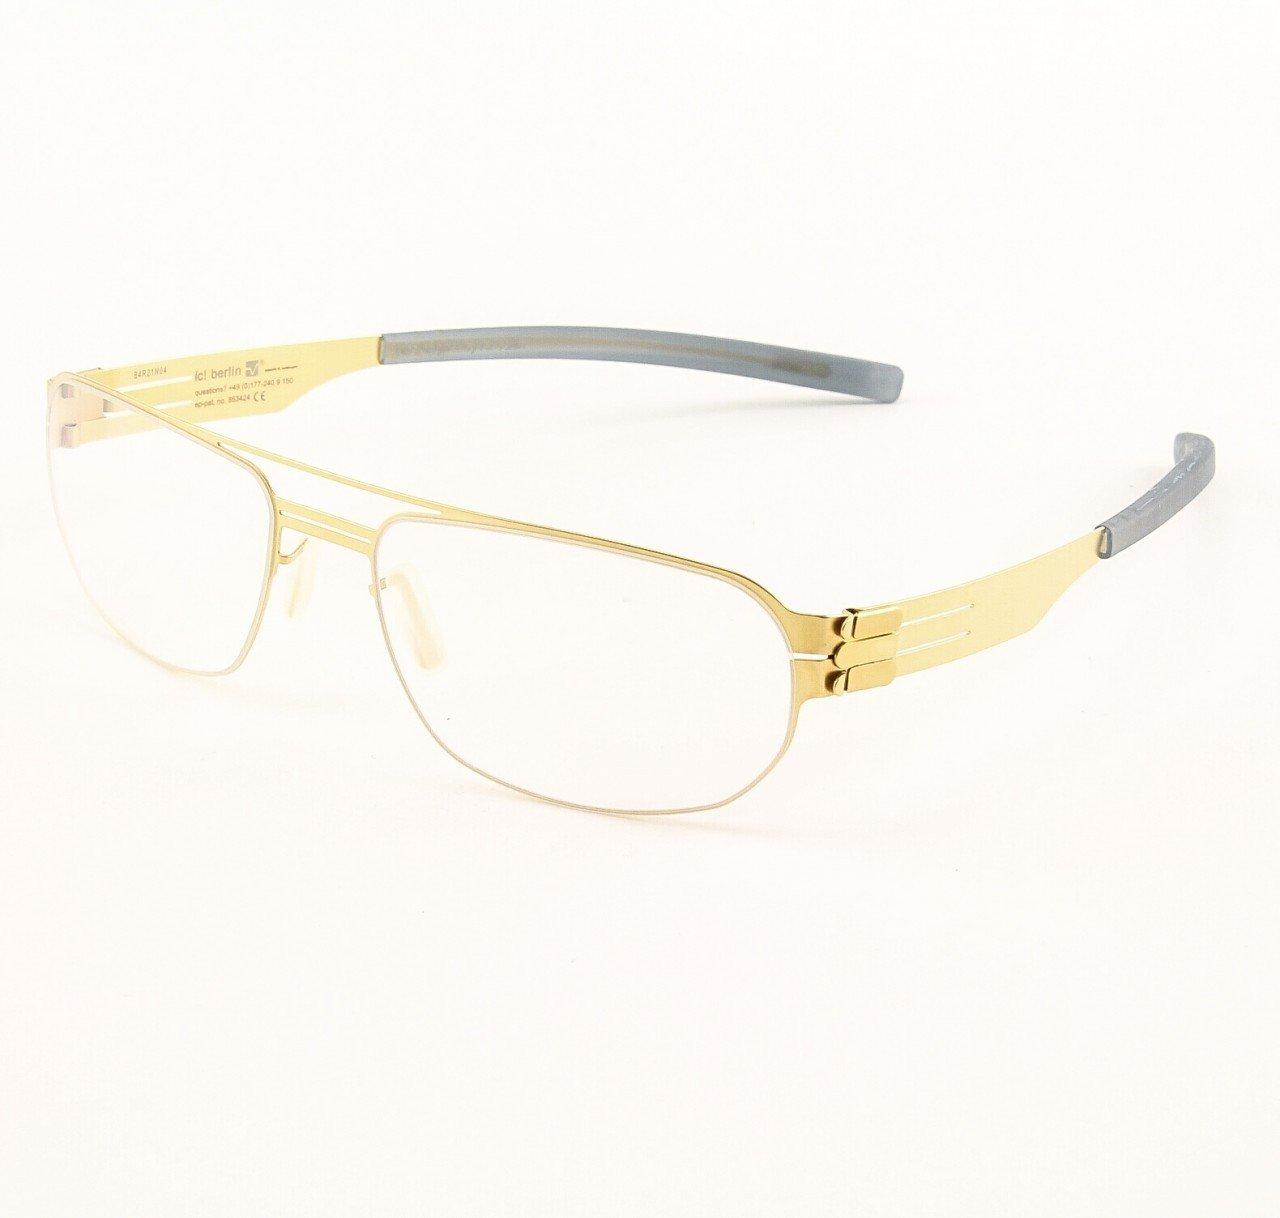 ic! Berlin Oleg P. Eyeglasses Col. matt Gold with Clear Lenses